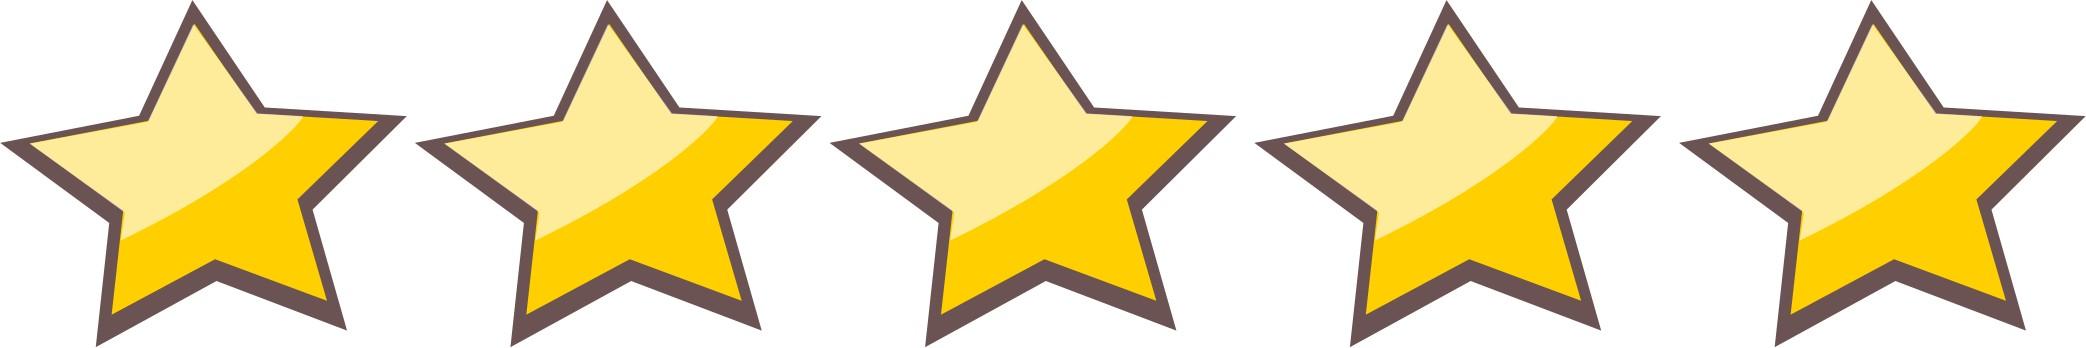 5 Stars Clipart.